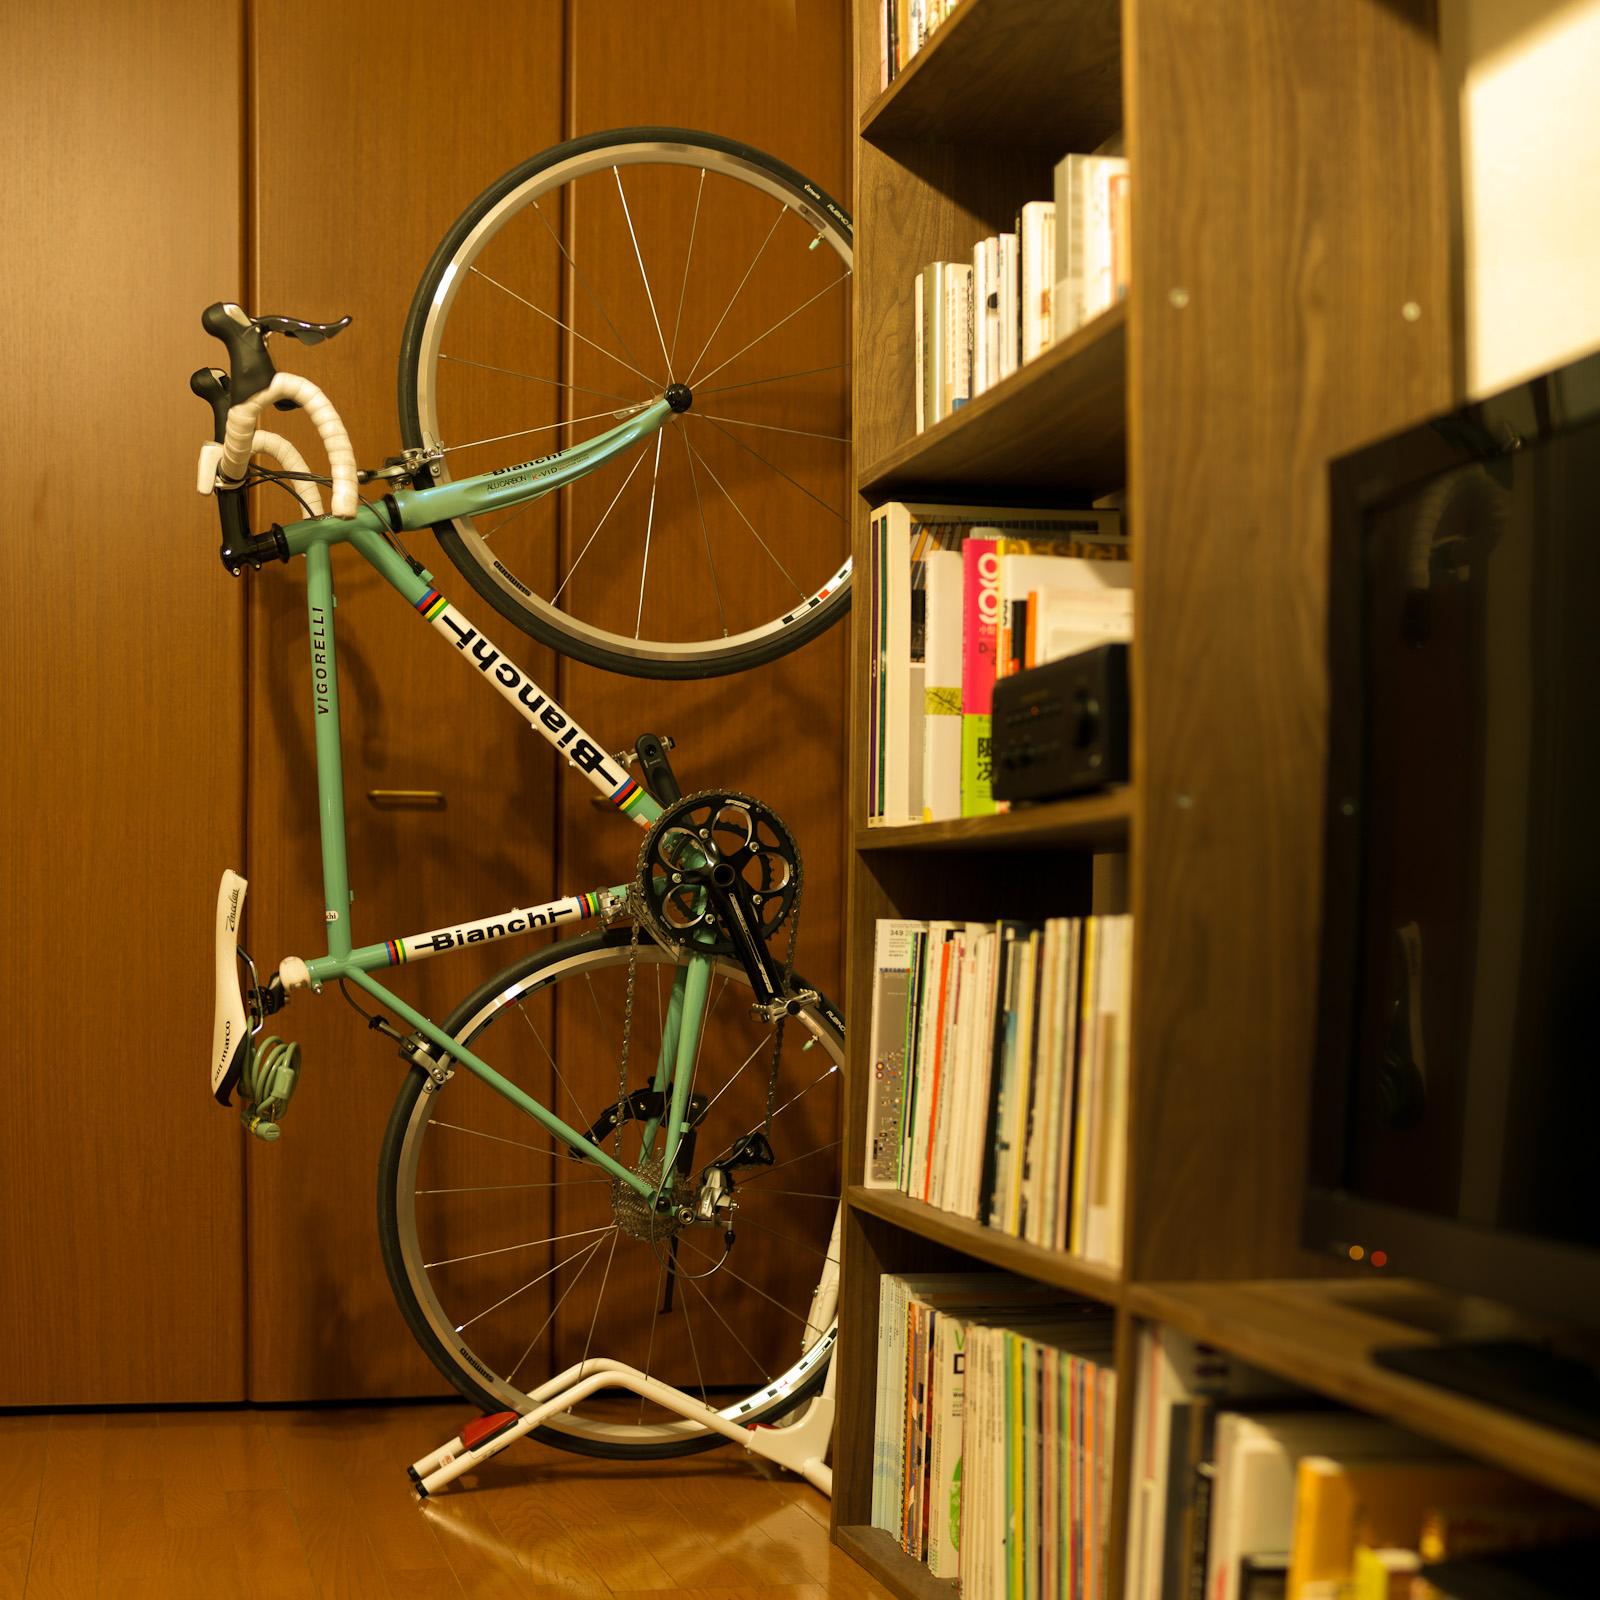 bianch_in_the_room_narashi2-2_1600.jpg